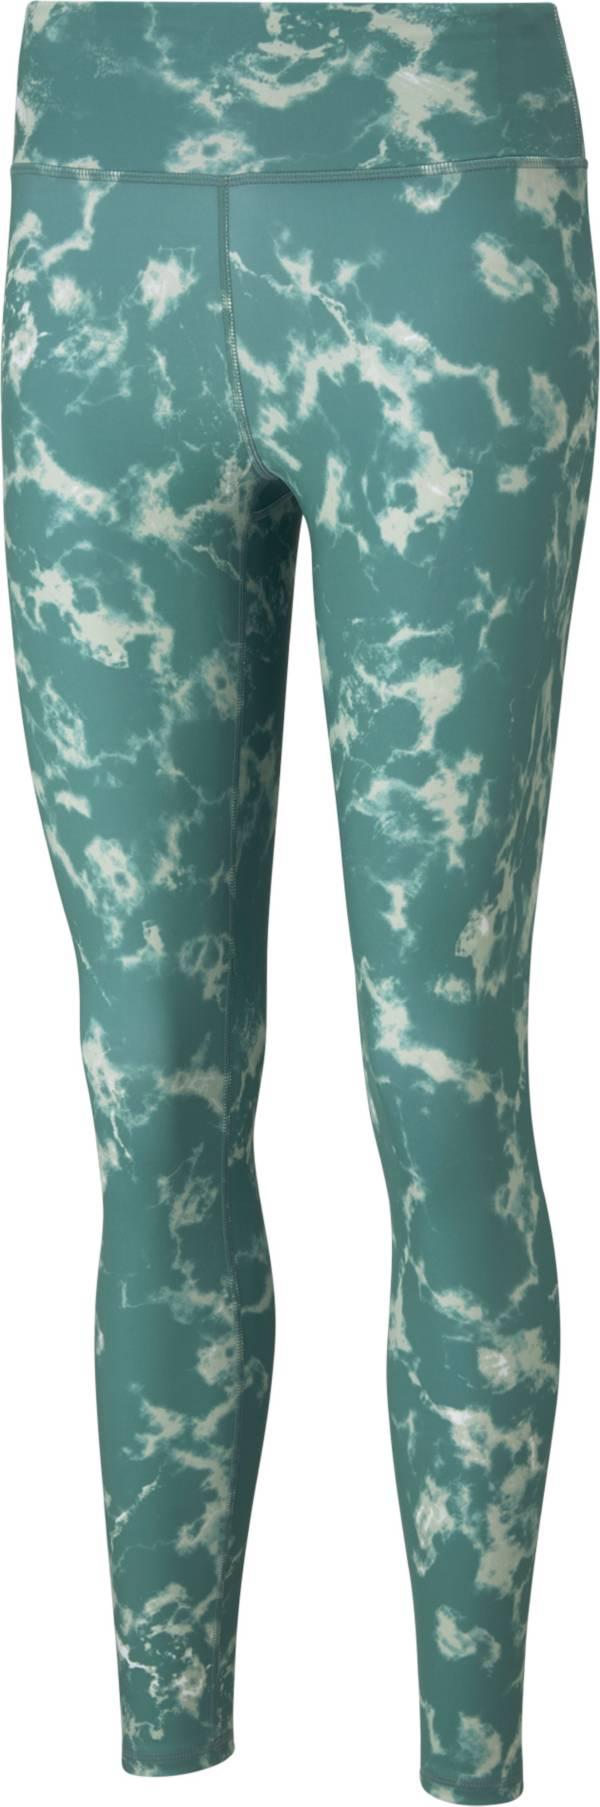 Puma Women's Print Legging product image